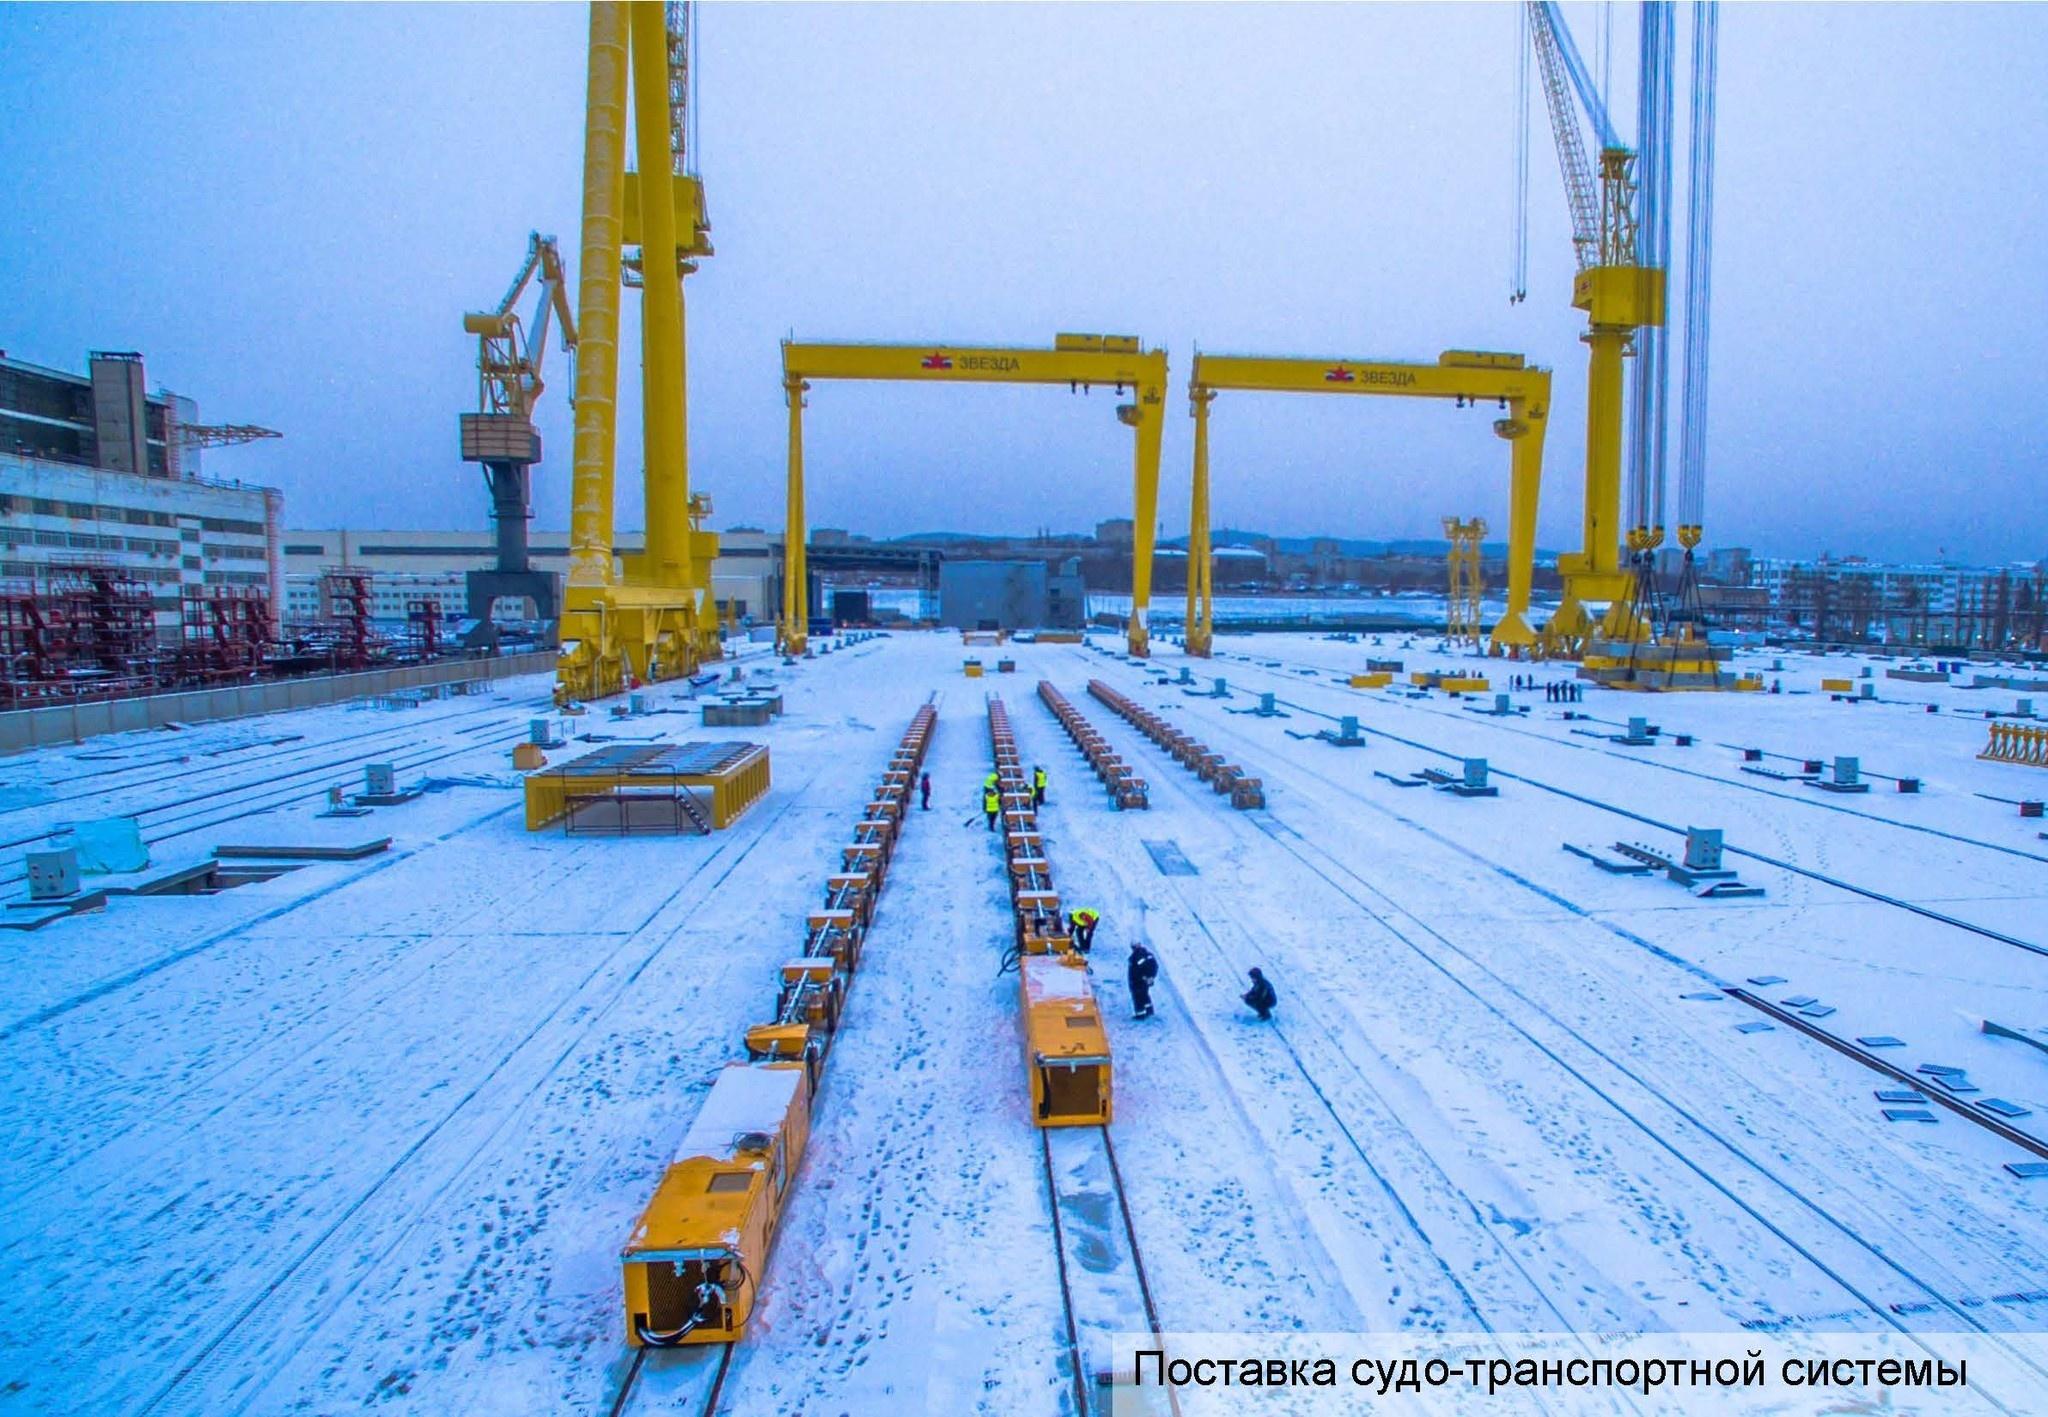 Russian Naval Shipbuilding Industry: News - Page 15 F_c2RlbGFub3VuYXMucnUvdXBsb2Fkcy85LzYvOTYzMTUxNTI2NTgwNV9vcmlnLmpwZWc_X19pZD0xMDI1Mjc=